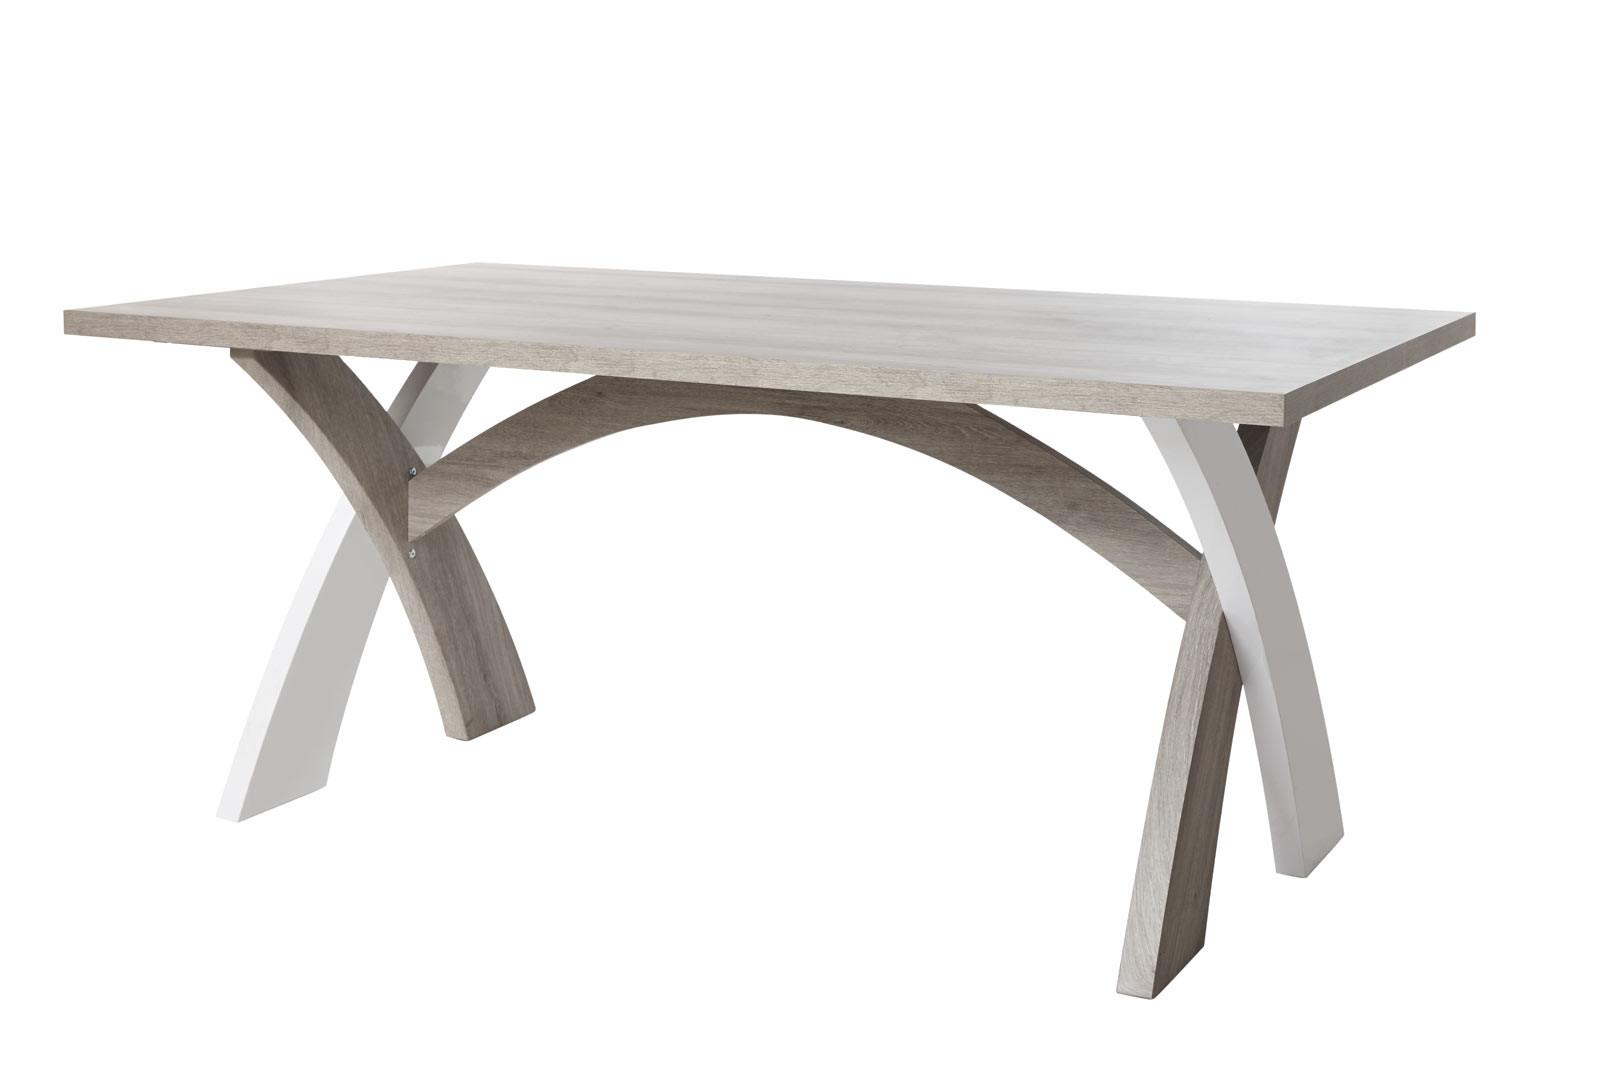 Table de salle à manger moderne chêne/blanc Saphir